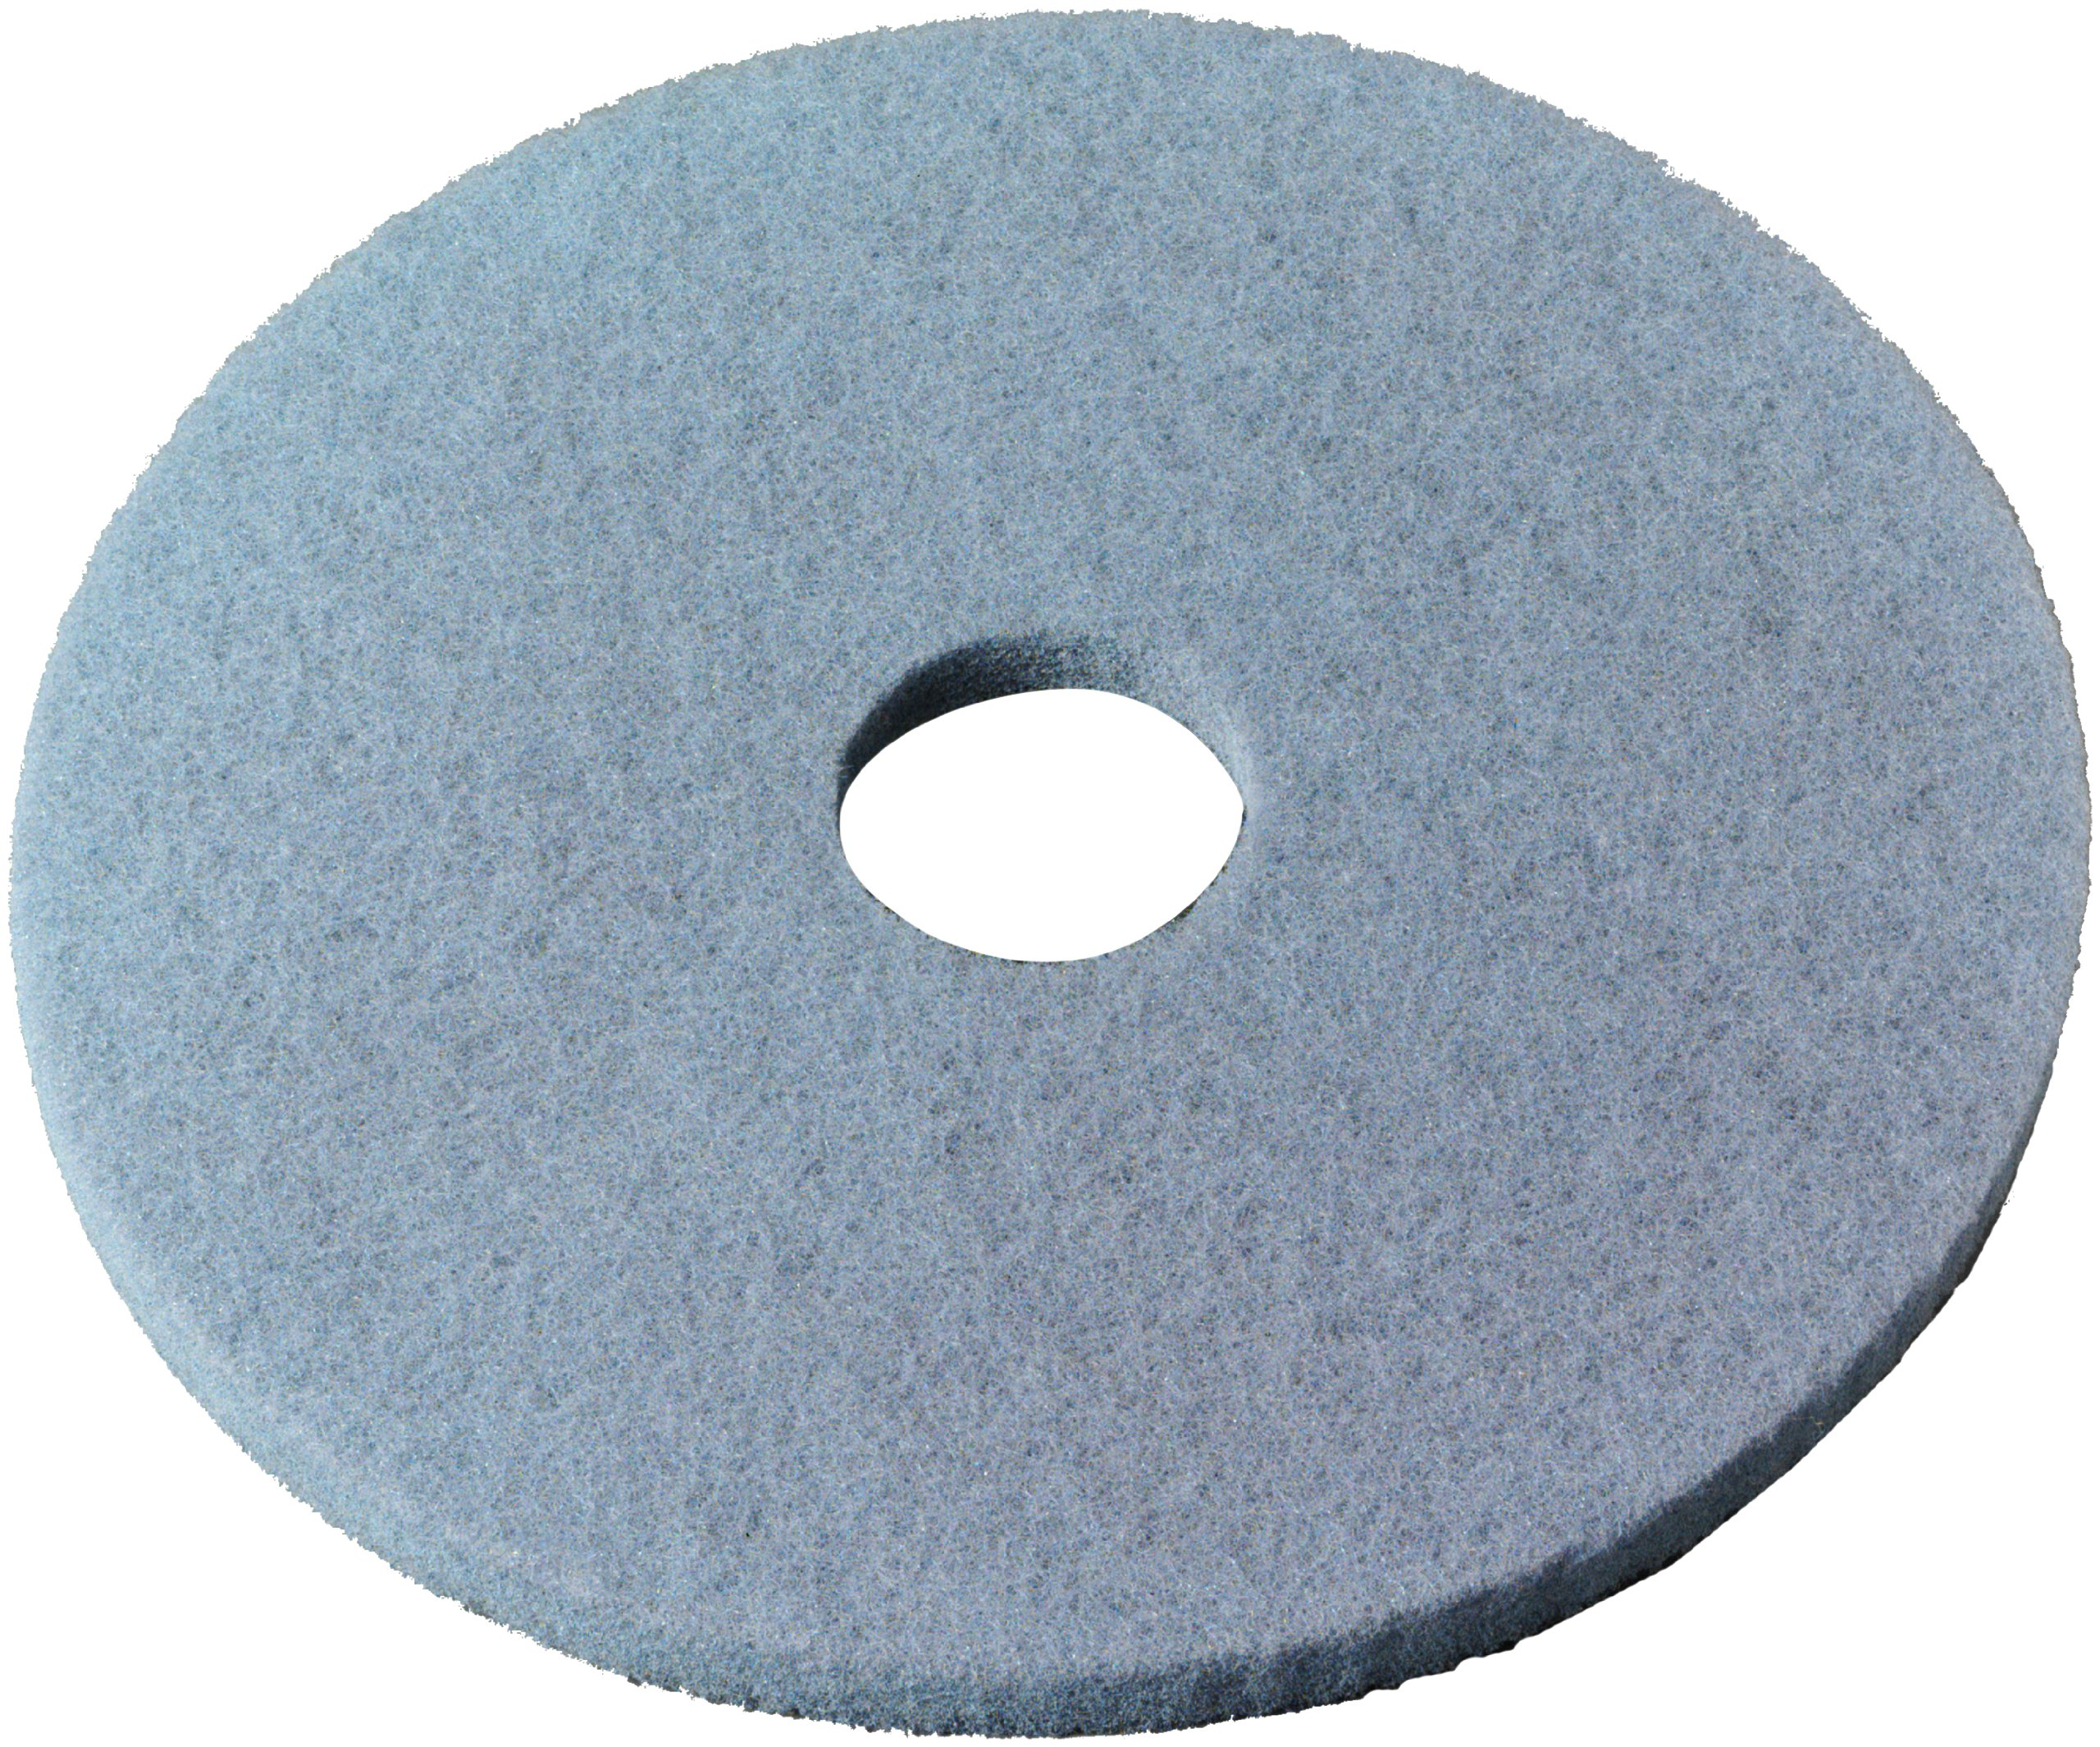 3M Aqua Burnish Pad 3100, 27'' x 1/4'' (Case of 5) by 3M